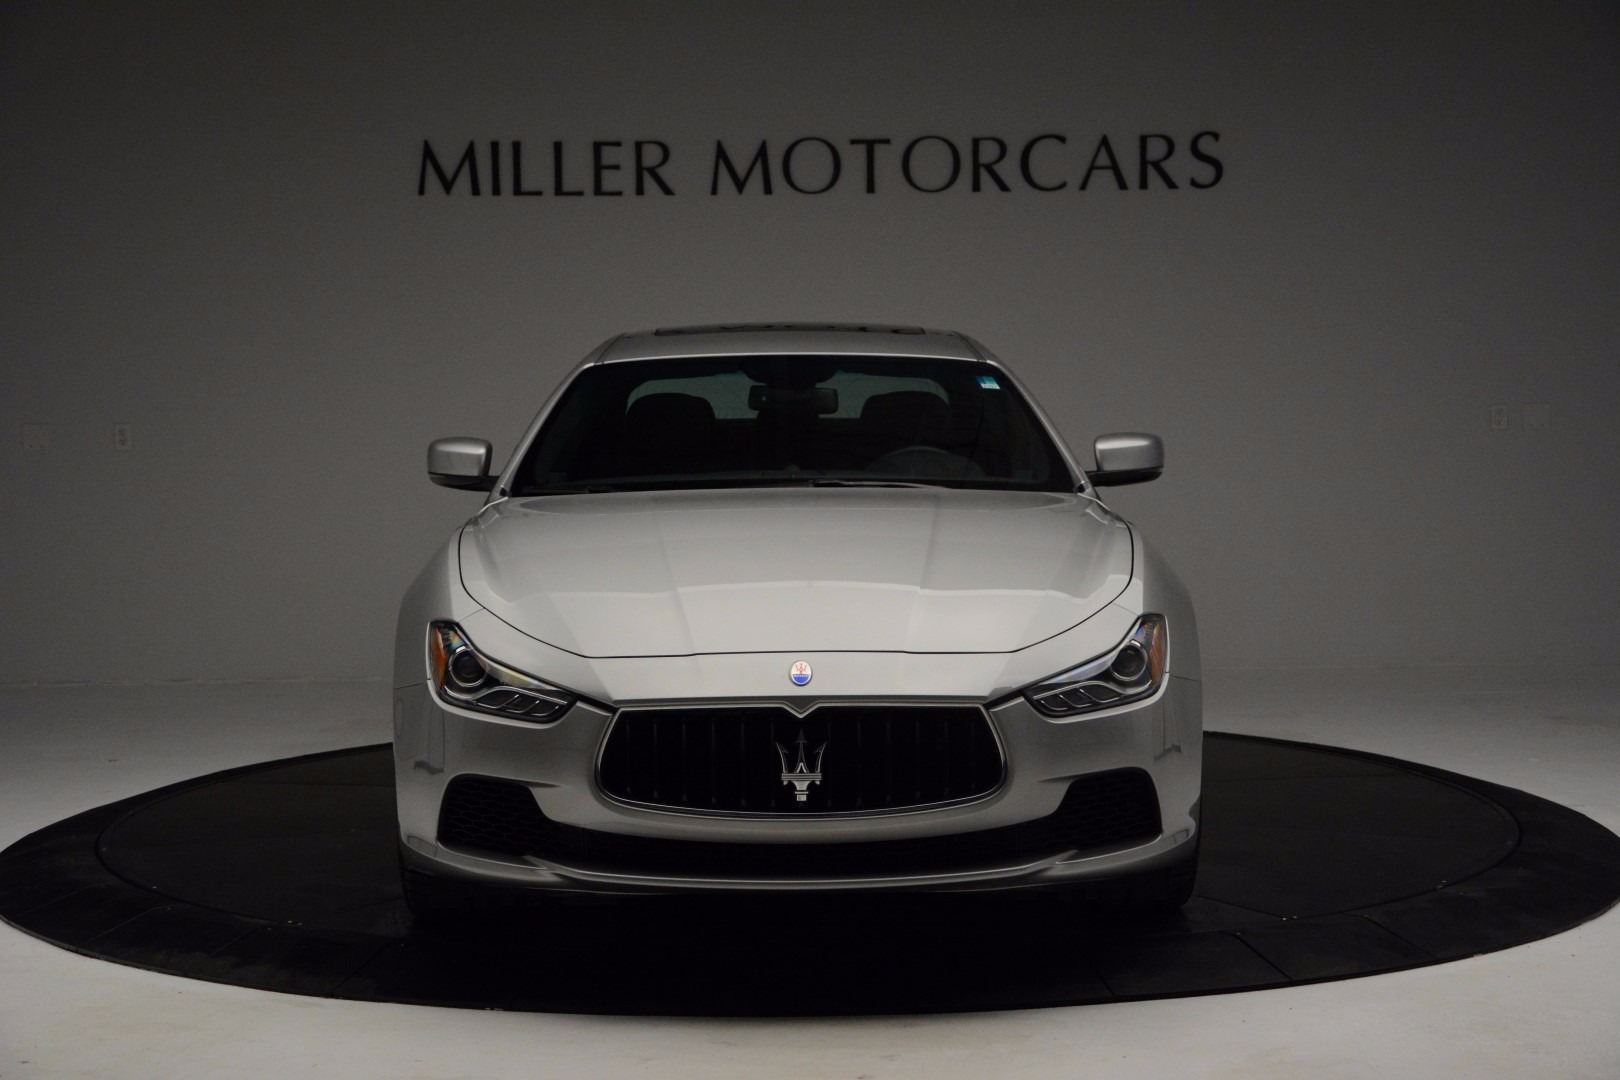 Used 2014 Maserati Ghibli  For Sale In Greenwich, CT 1099_p11